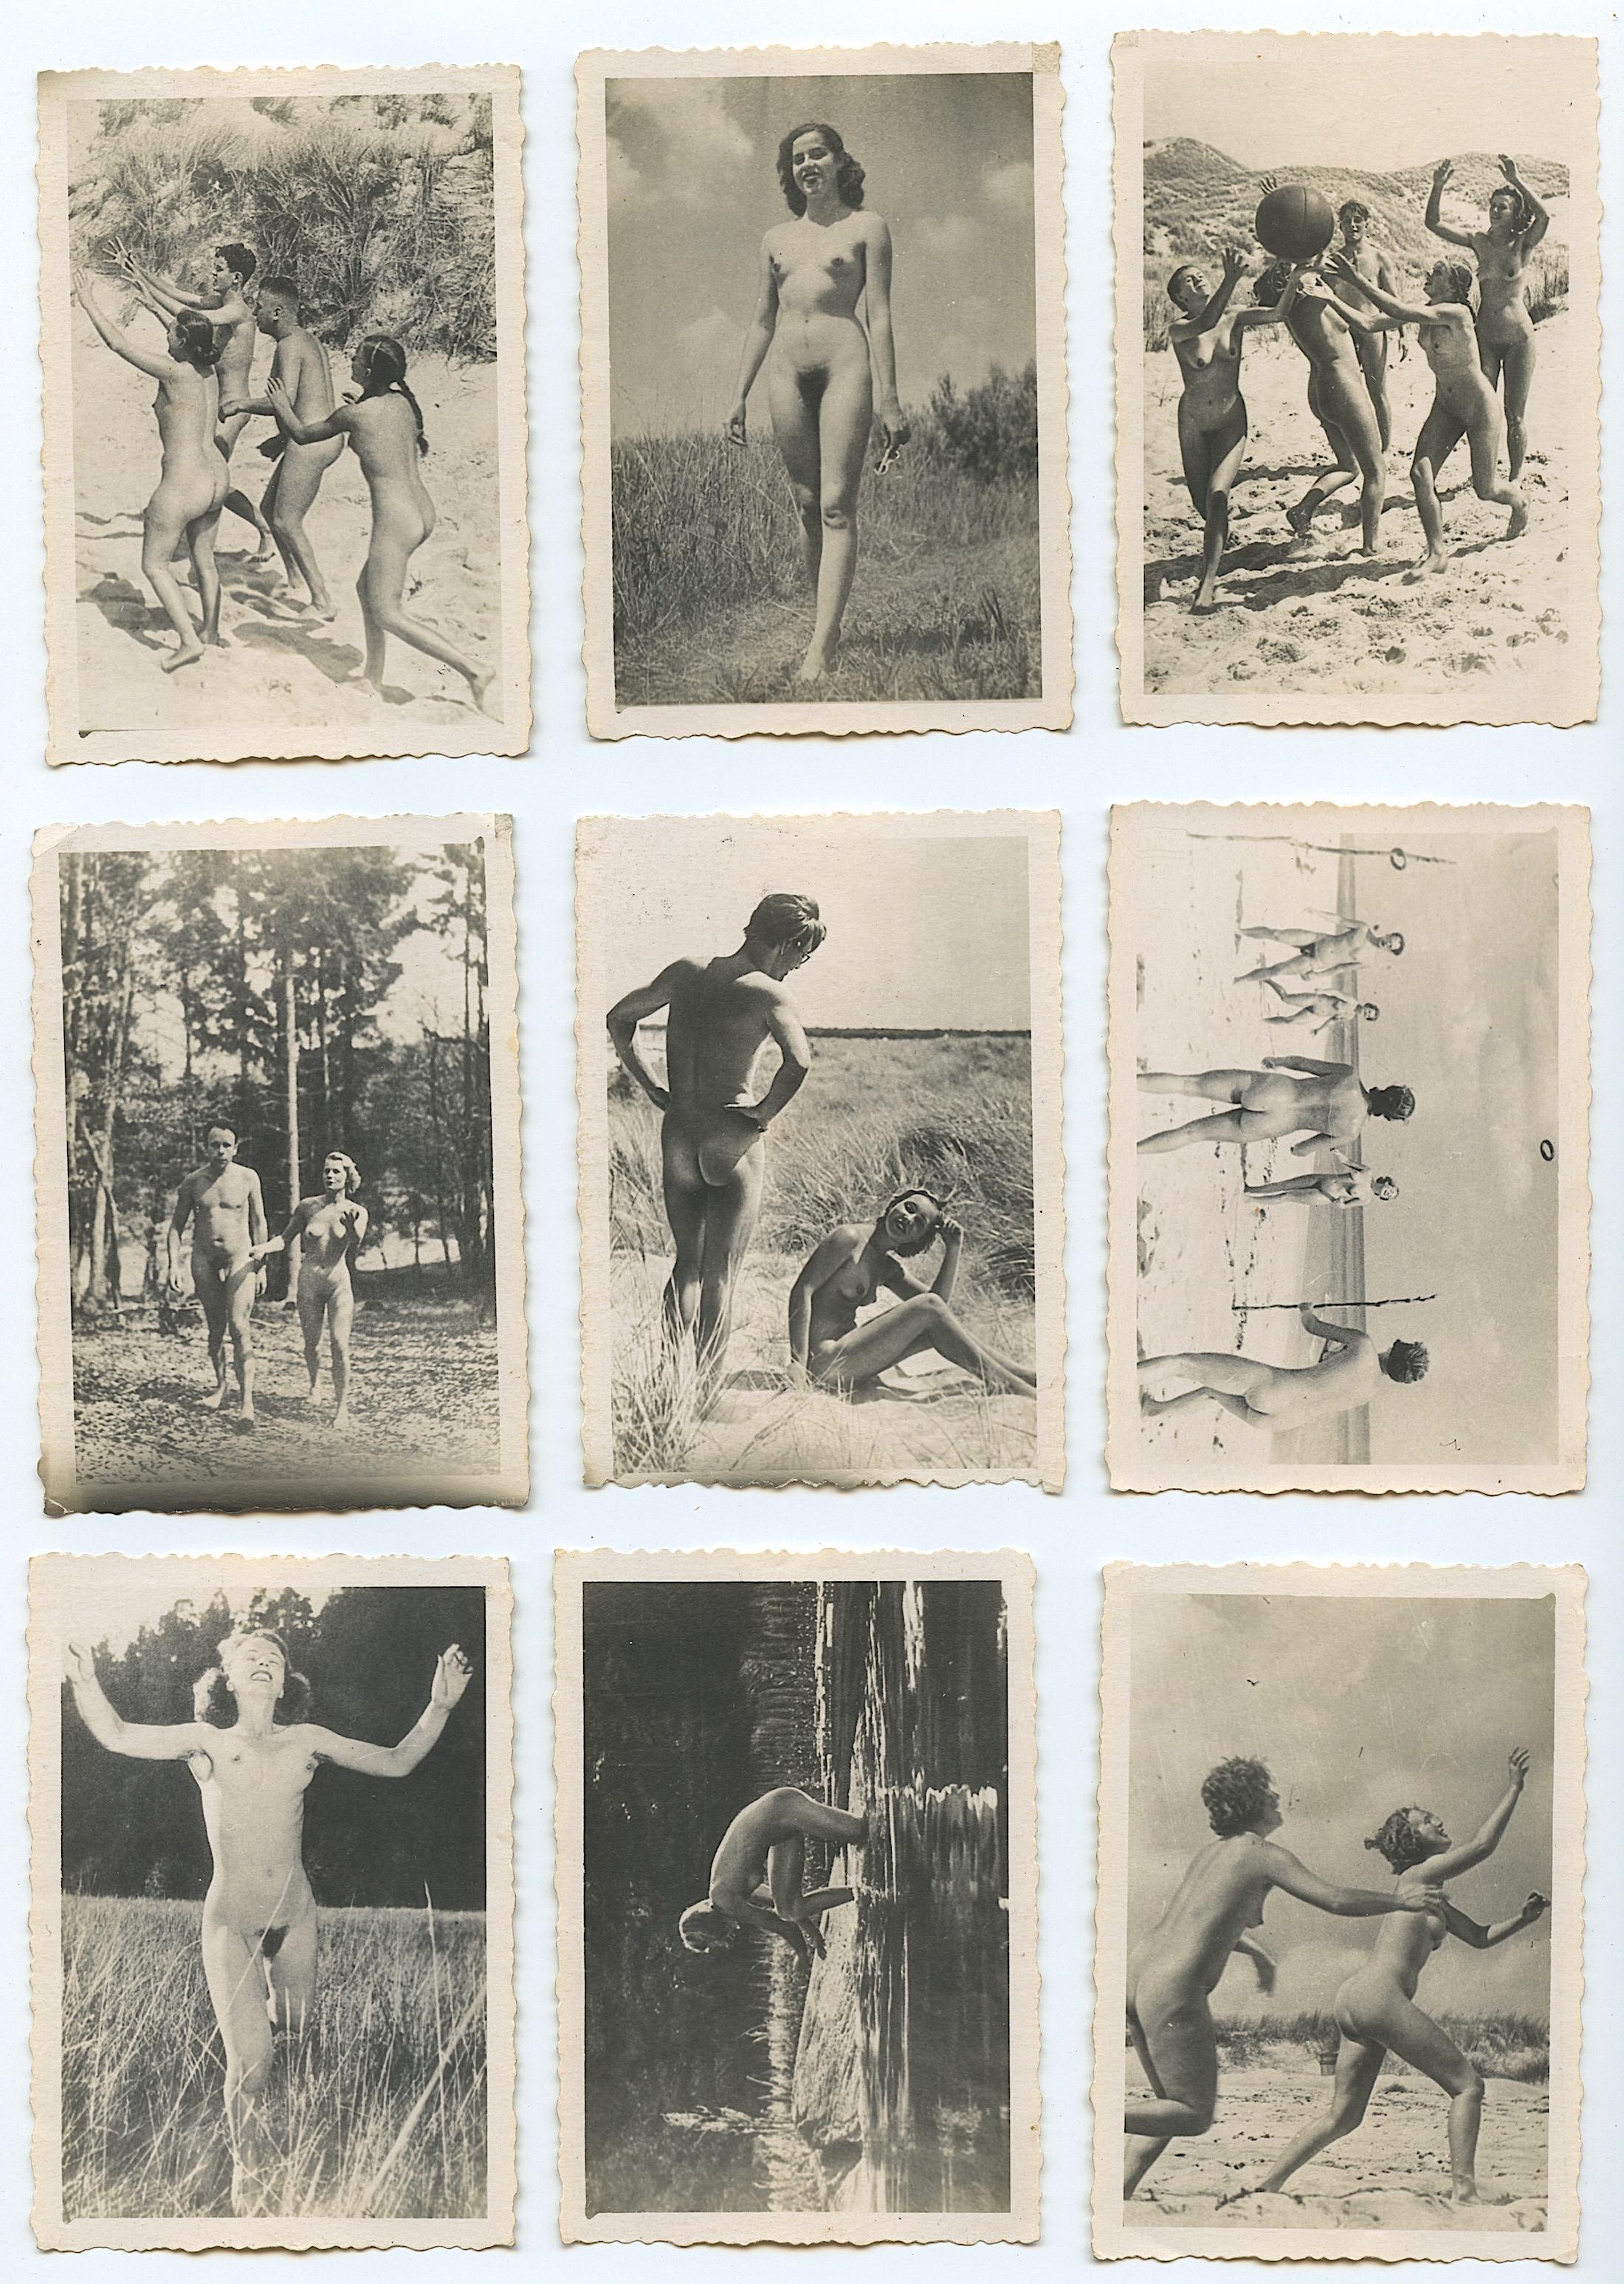 Lot - Set with 9 Vintage Nudism Naturalism Photos, 1940s